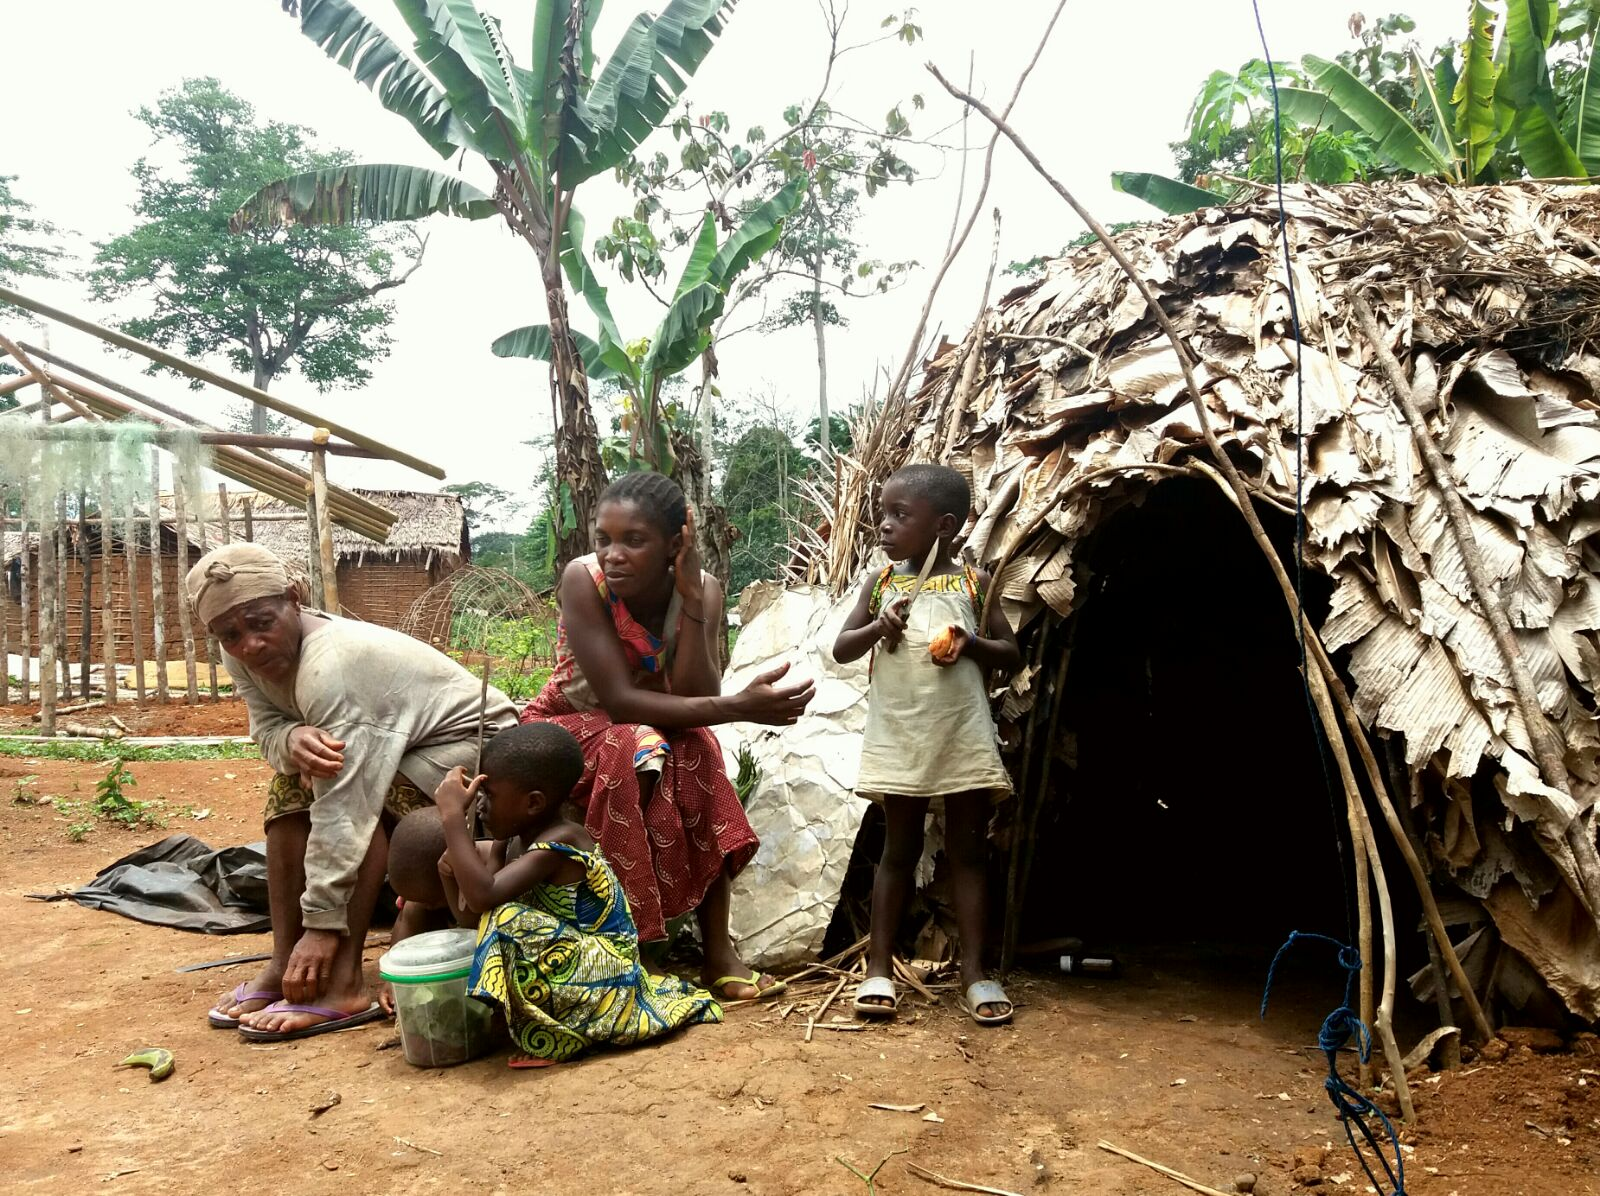 Cameroon 24-029 Baka women and children outside traditional hut, Credit - Eva Avila